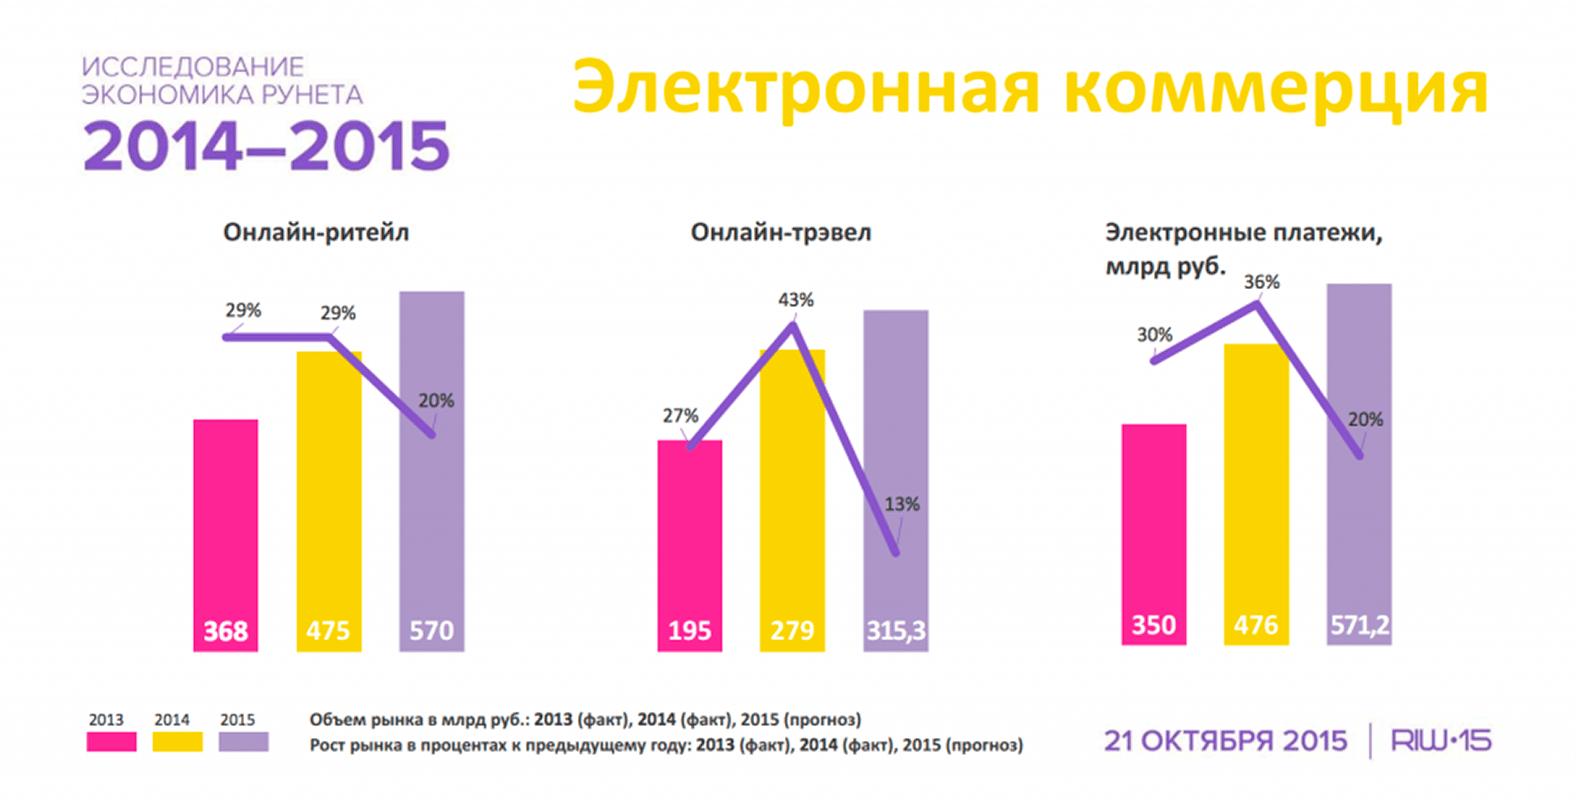 экономика рунета интернет магазины